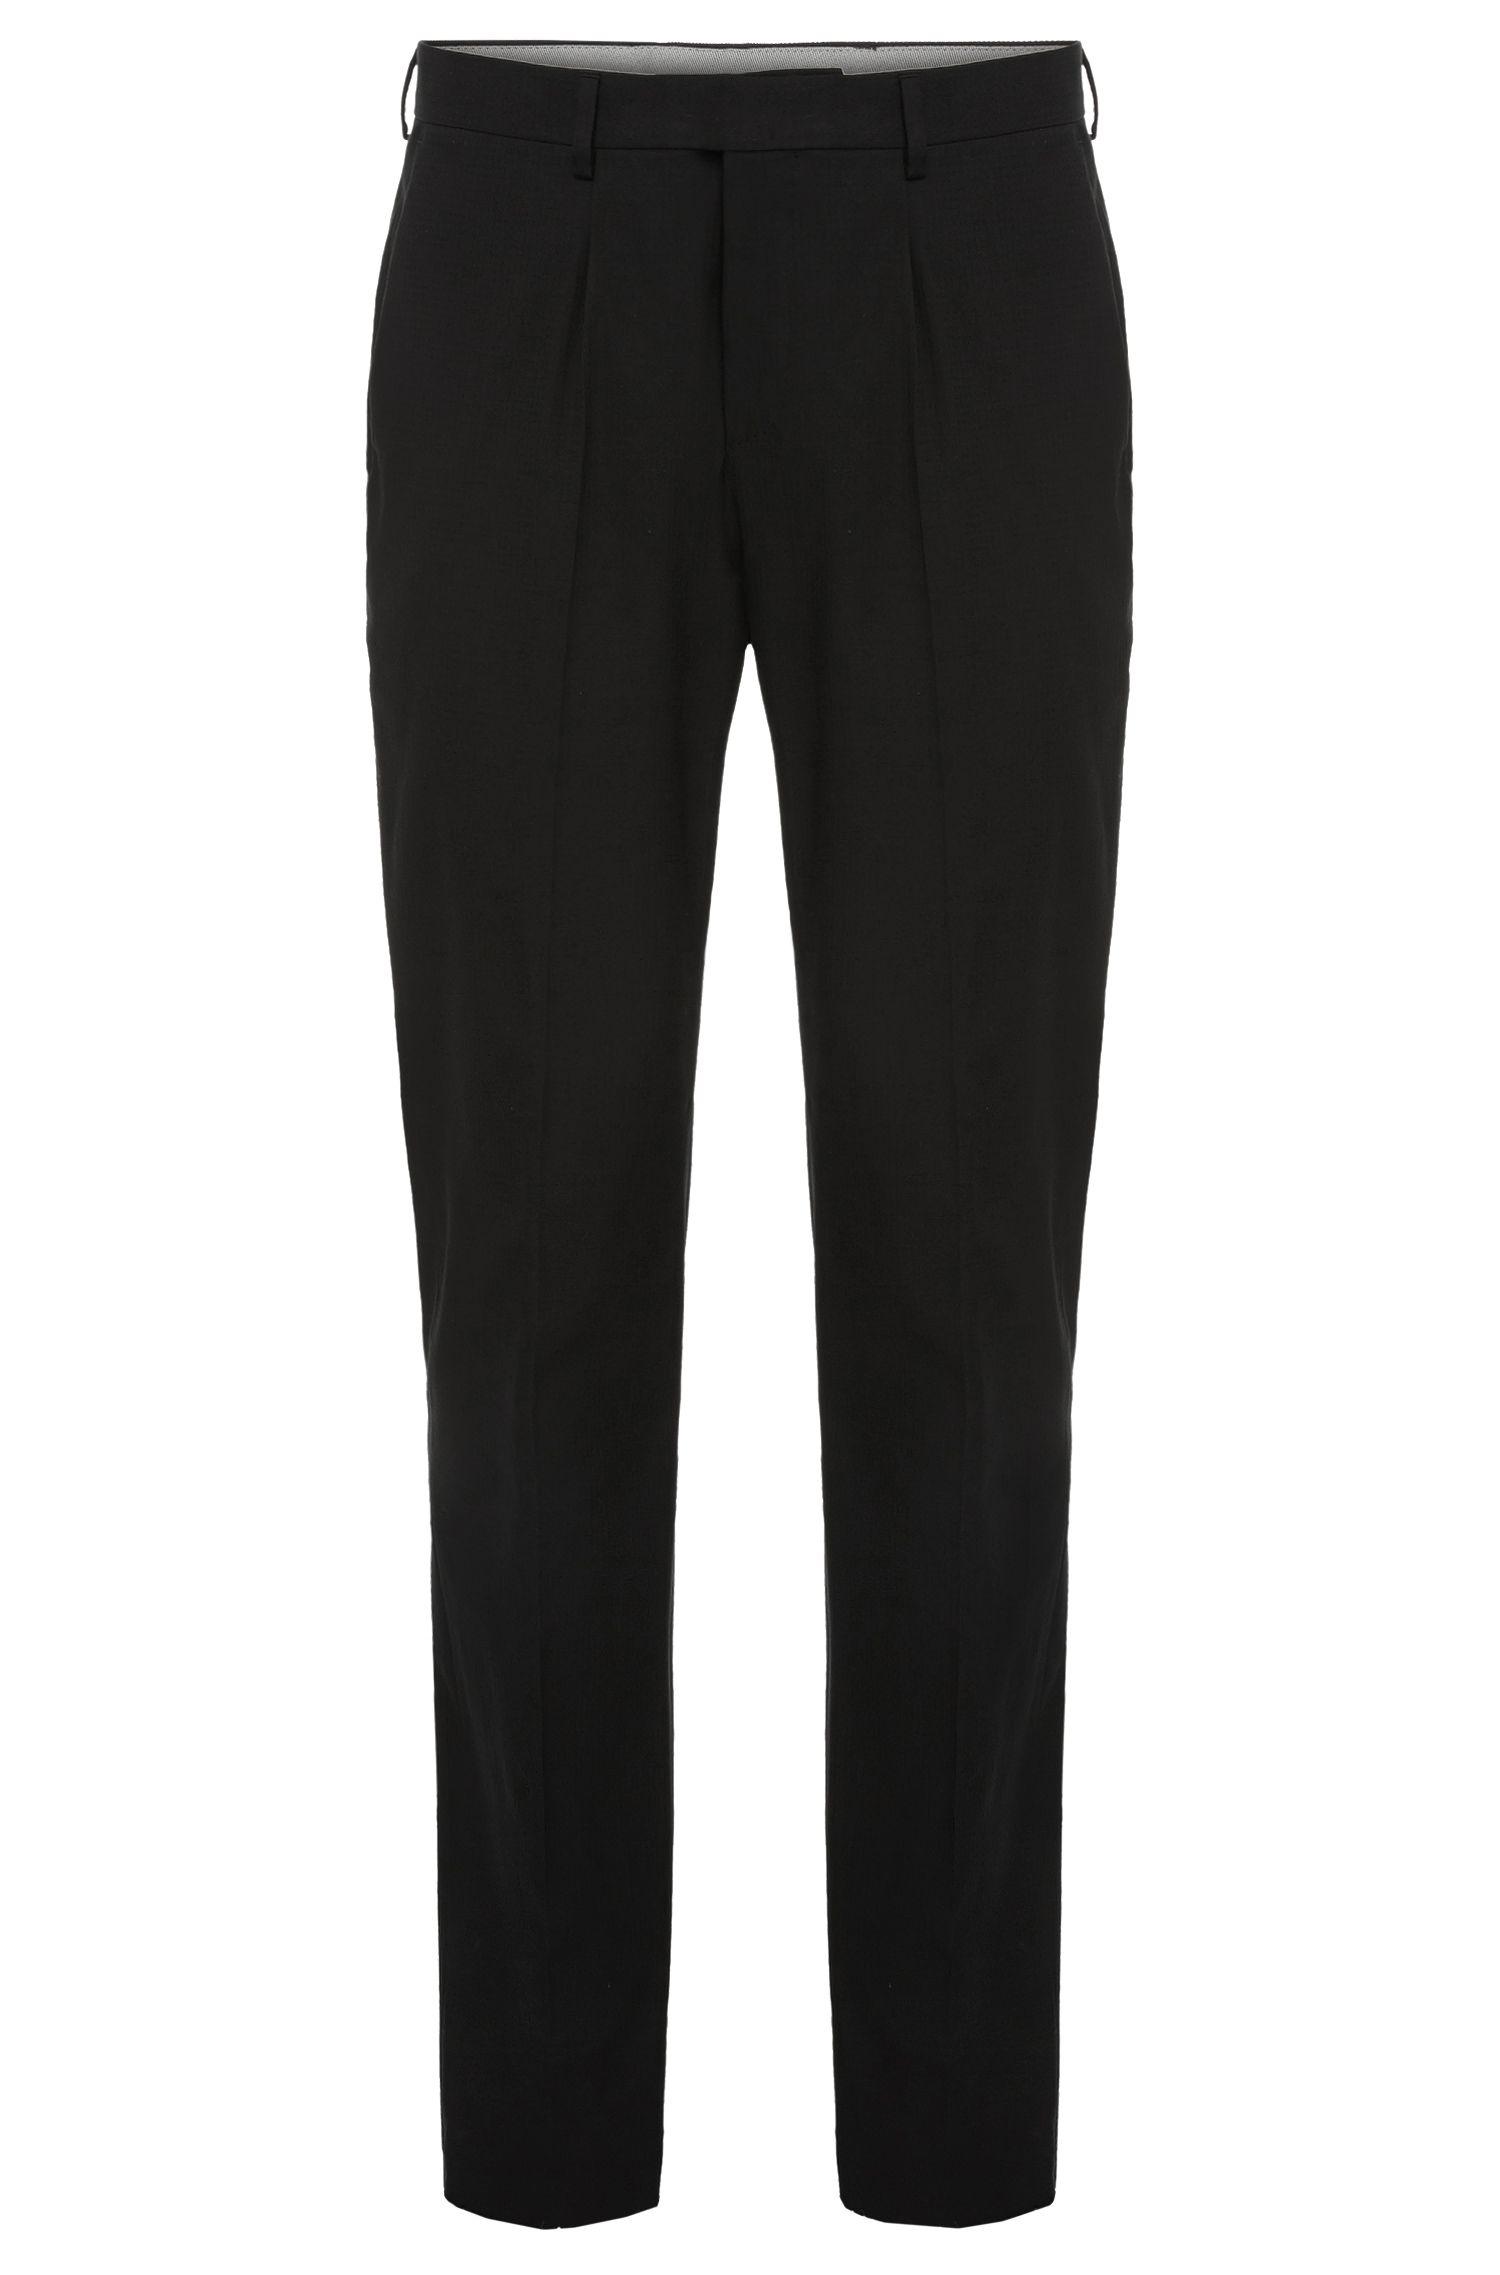 'T-Gilroy' | Slim Fit, Italian Stretch Cotton Dress Pants